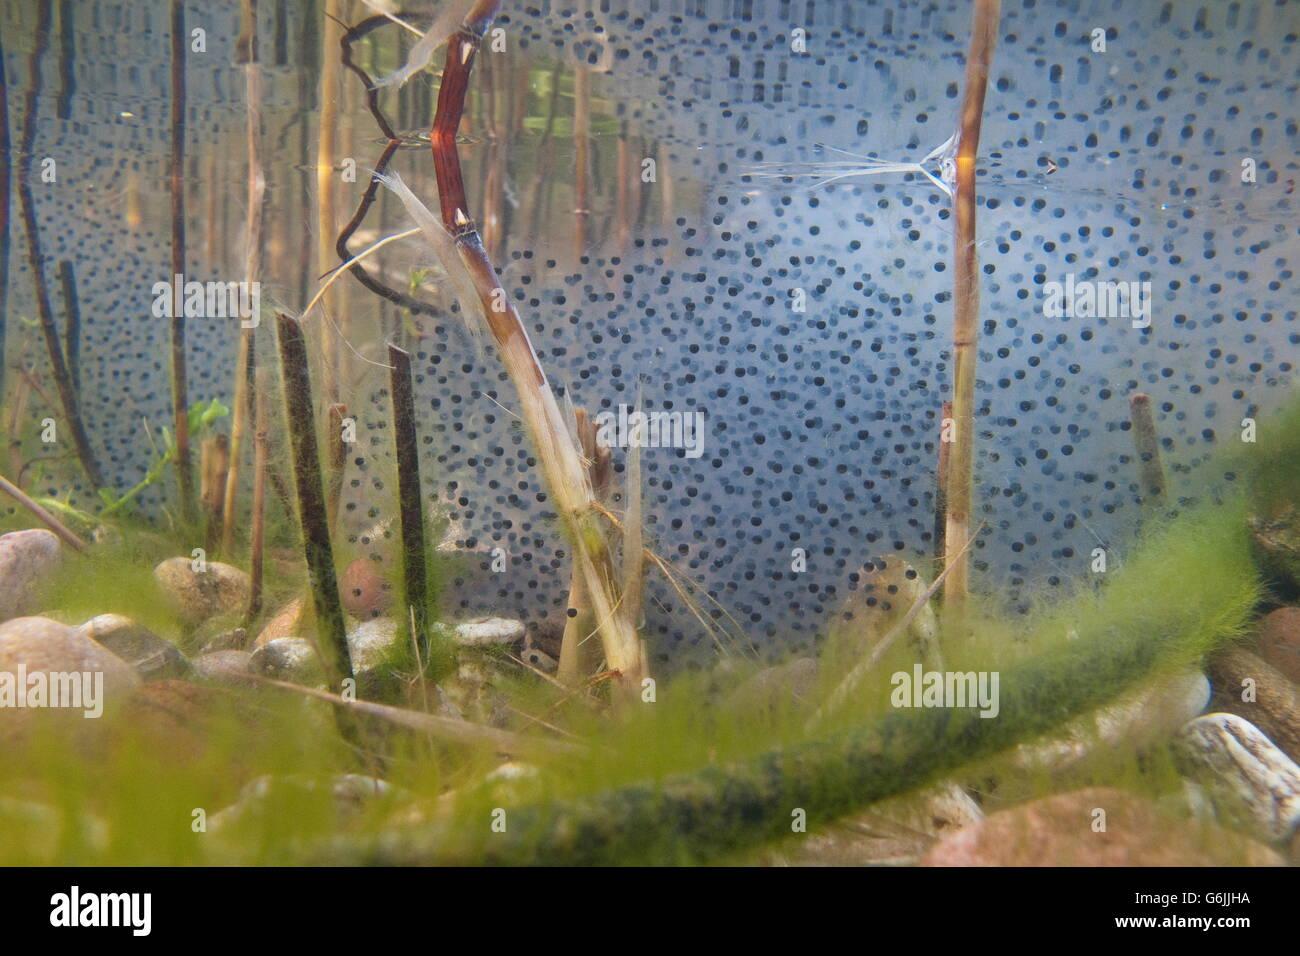 common frog, spawn, Germany / (Rana temporaria) - Stock Image